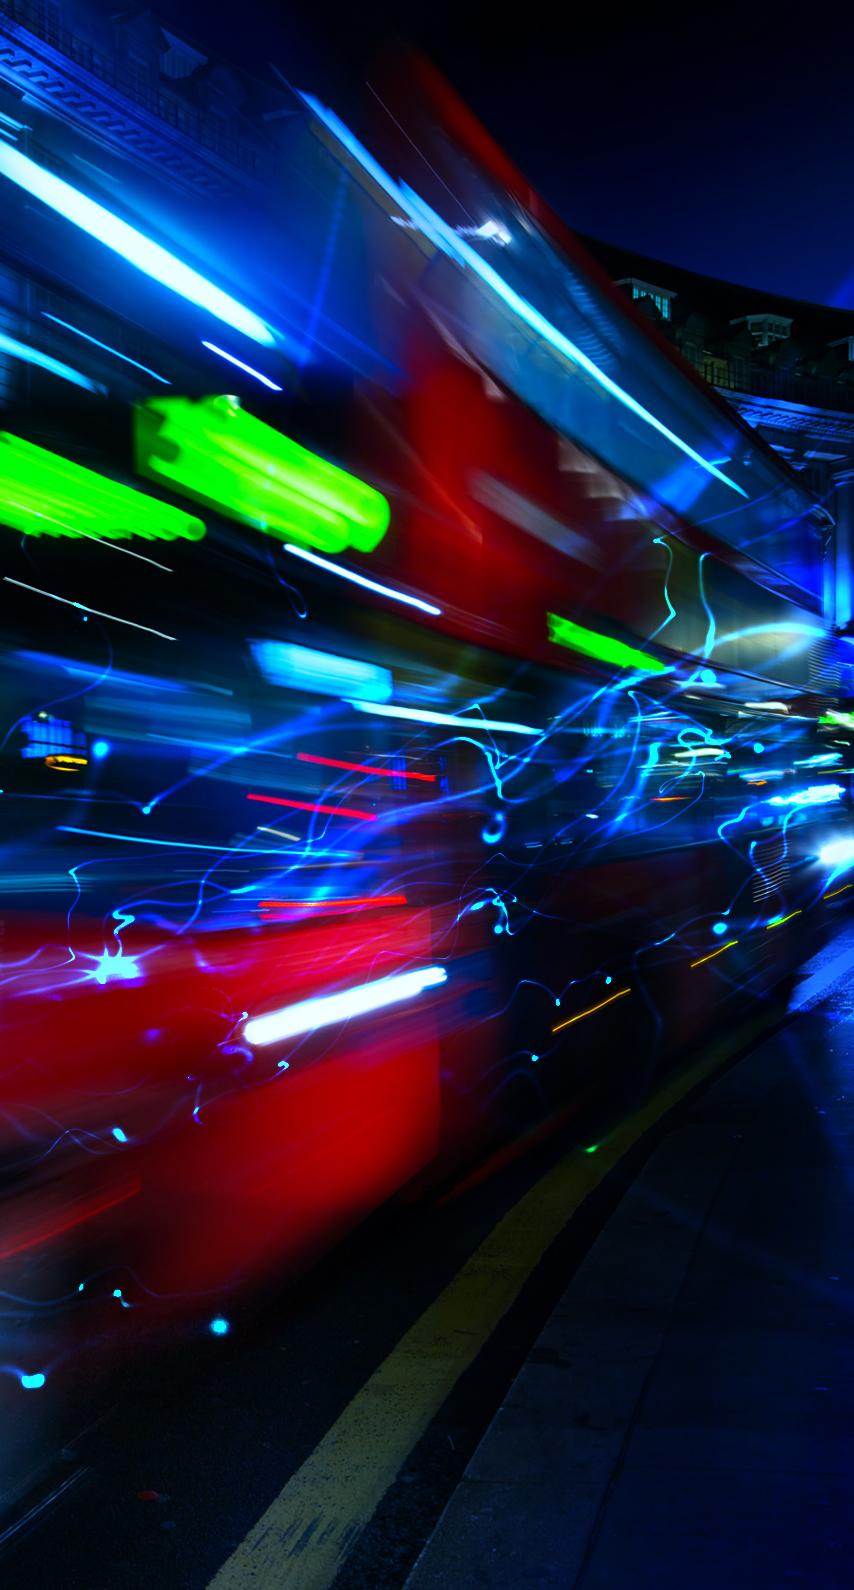 blur, line, fractal, element, energy, speed, movement